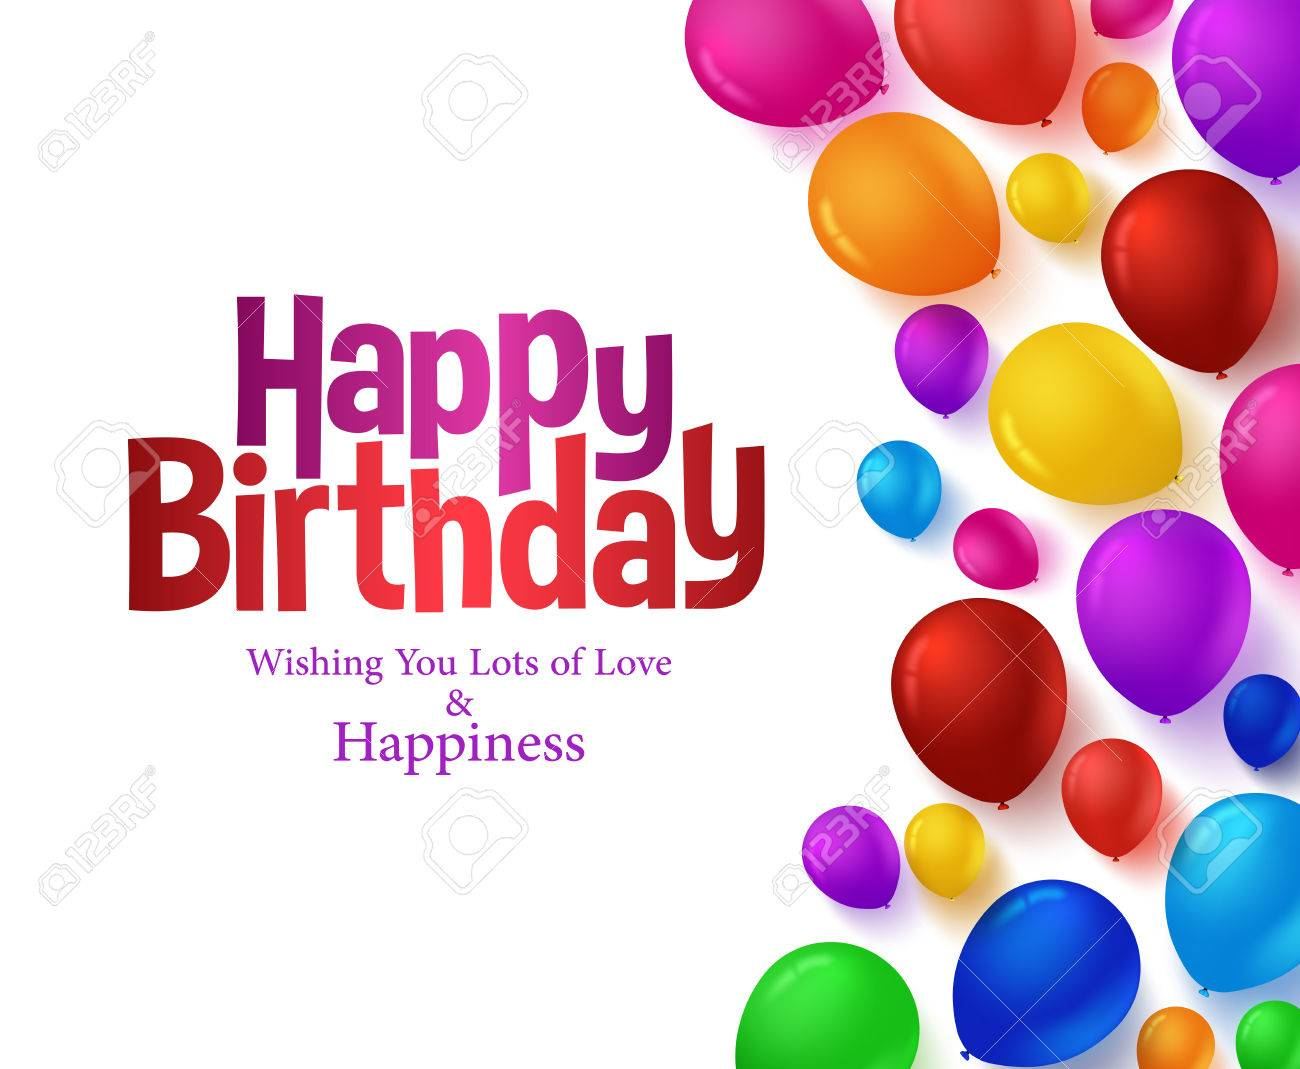 happy birthday balloons background - Kubre.euforic.co